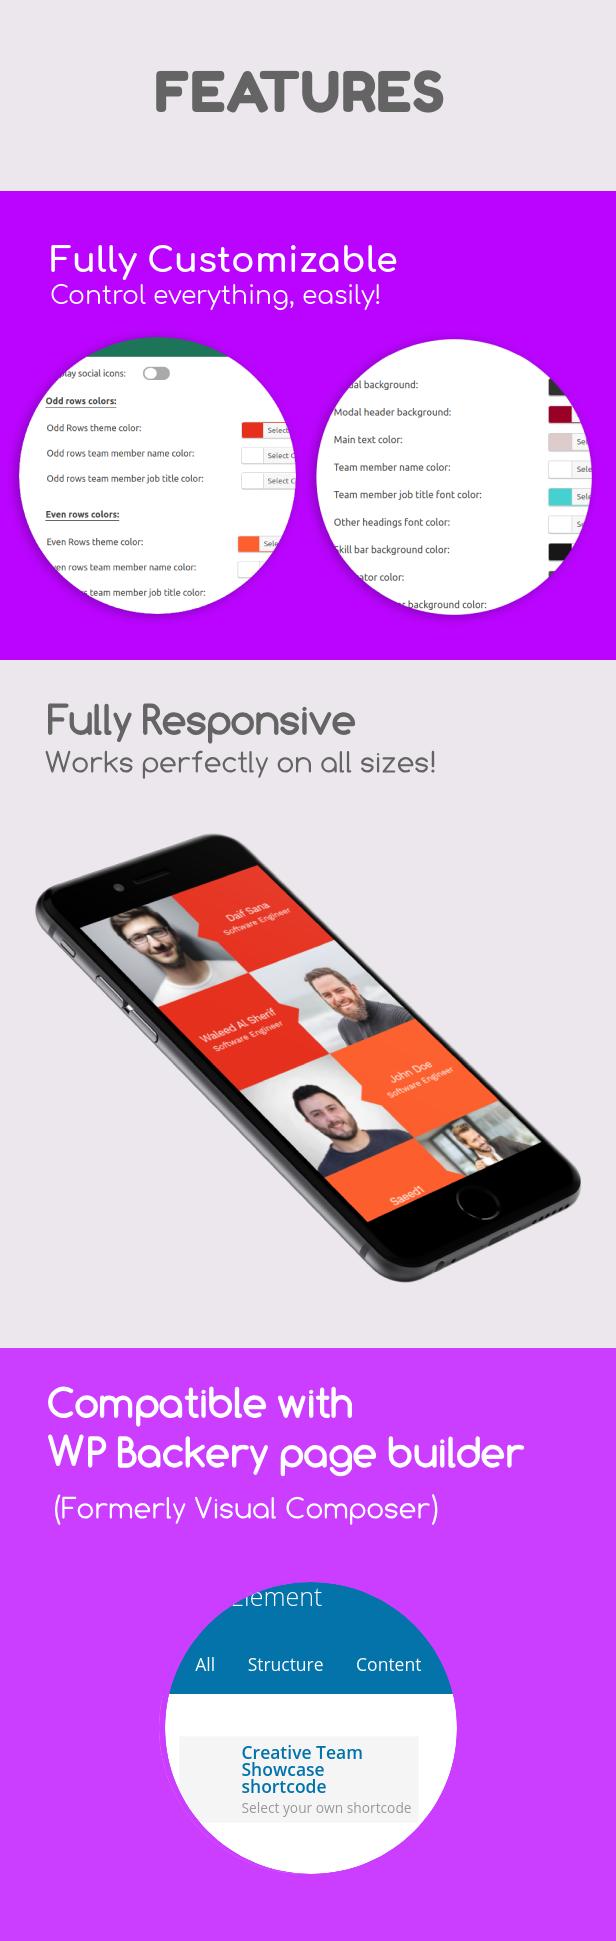 Creative Team Showcase - Team Showcase Plugin for WordPress - 3